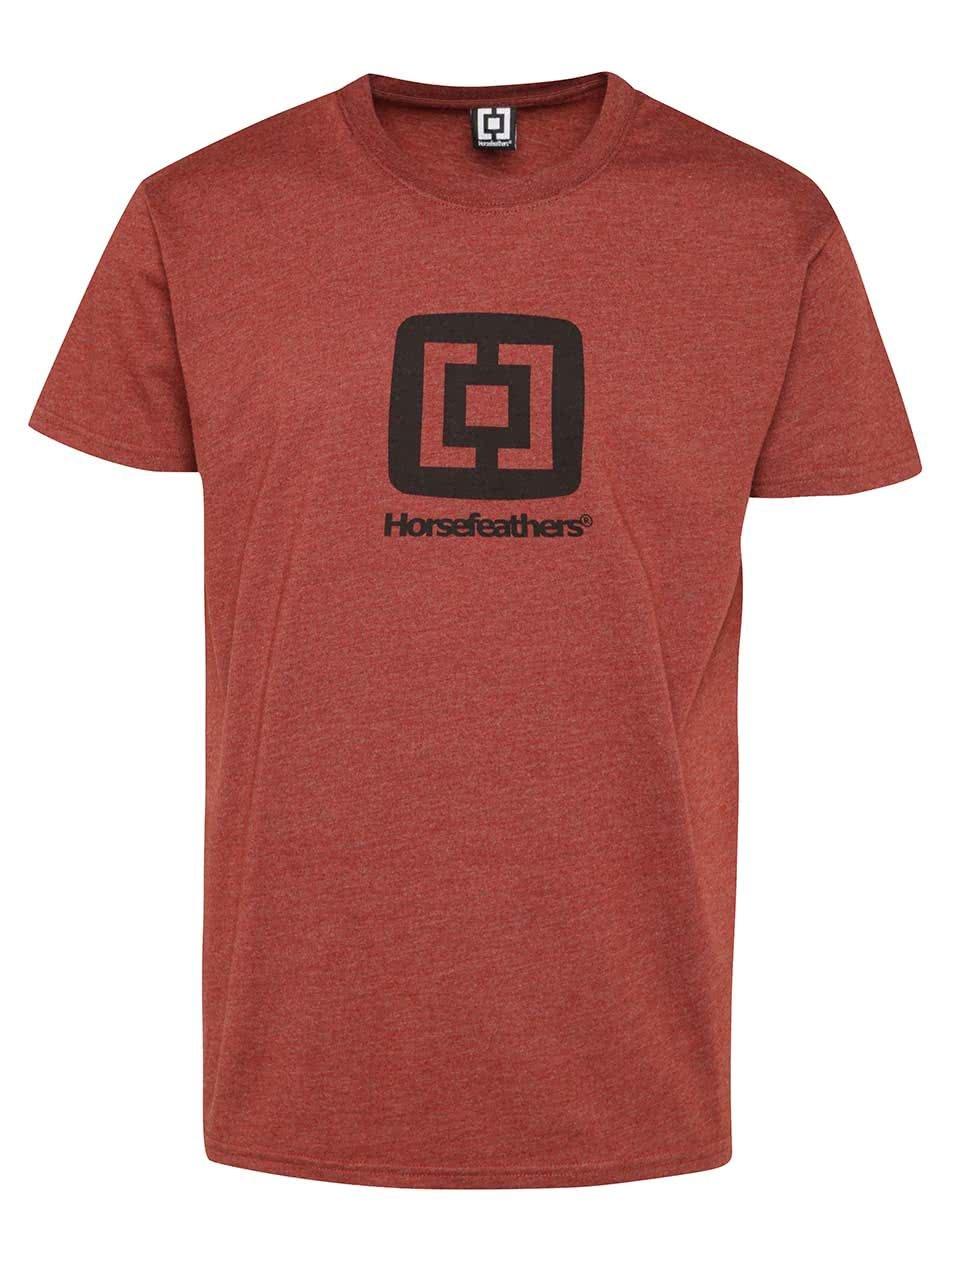 Tmavě červené pánské triko s potiskem Horsefeathers Fair